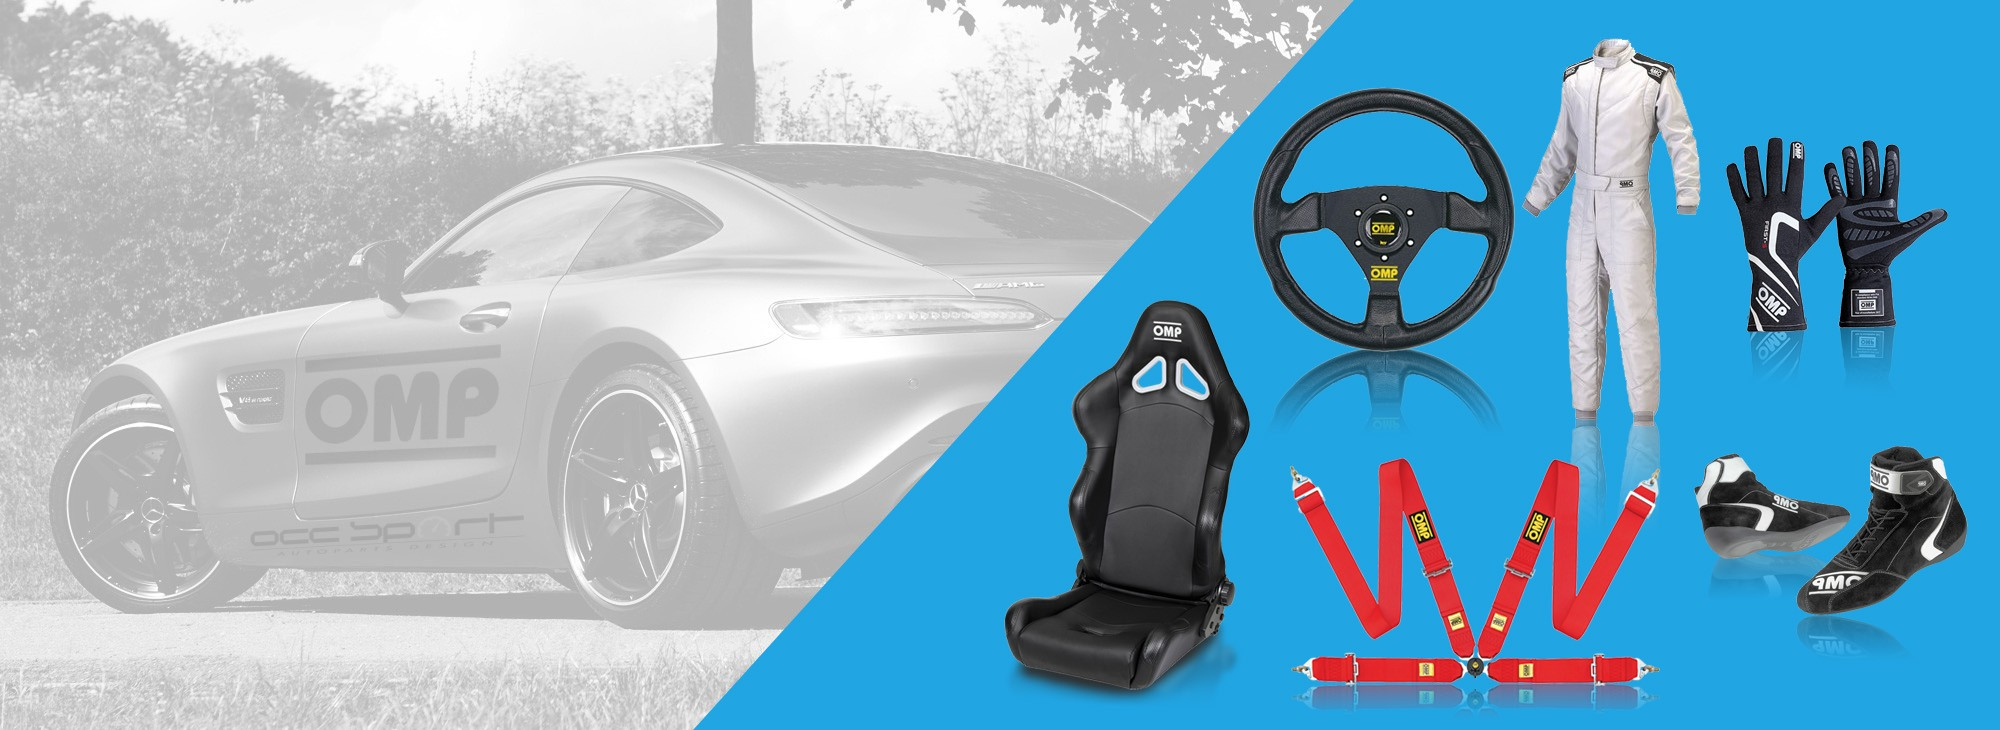 Omp OMP1033PVCBK Speed Kit Funda Asientos de Vinilo Negro